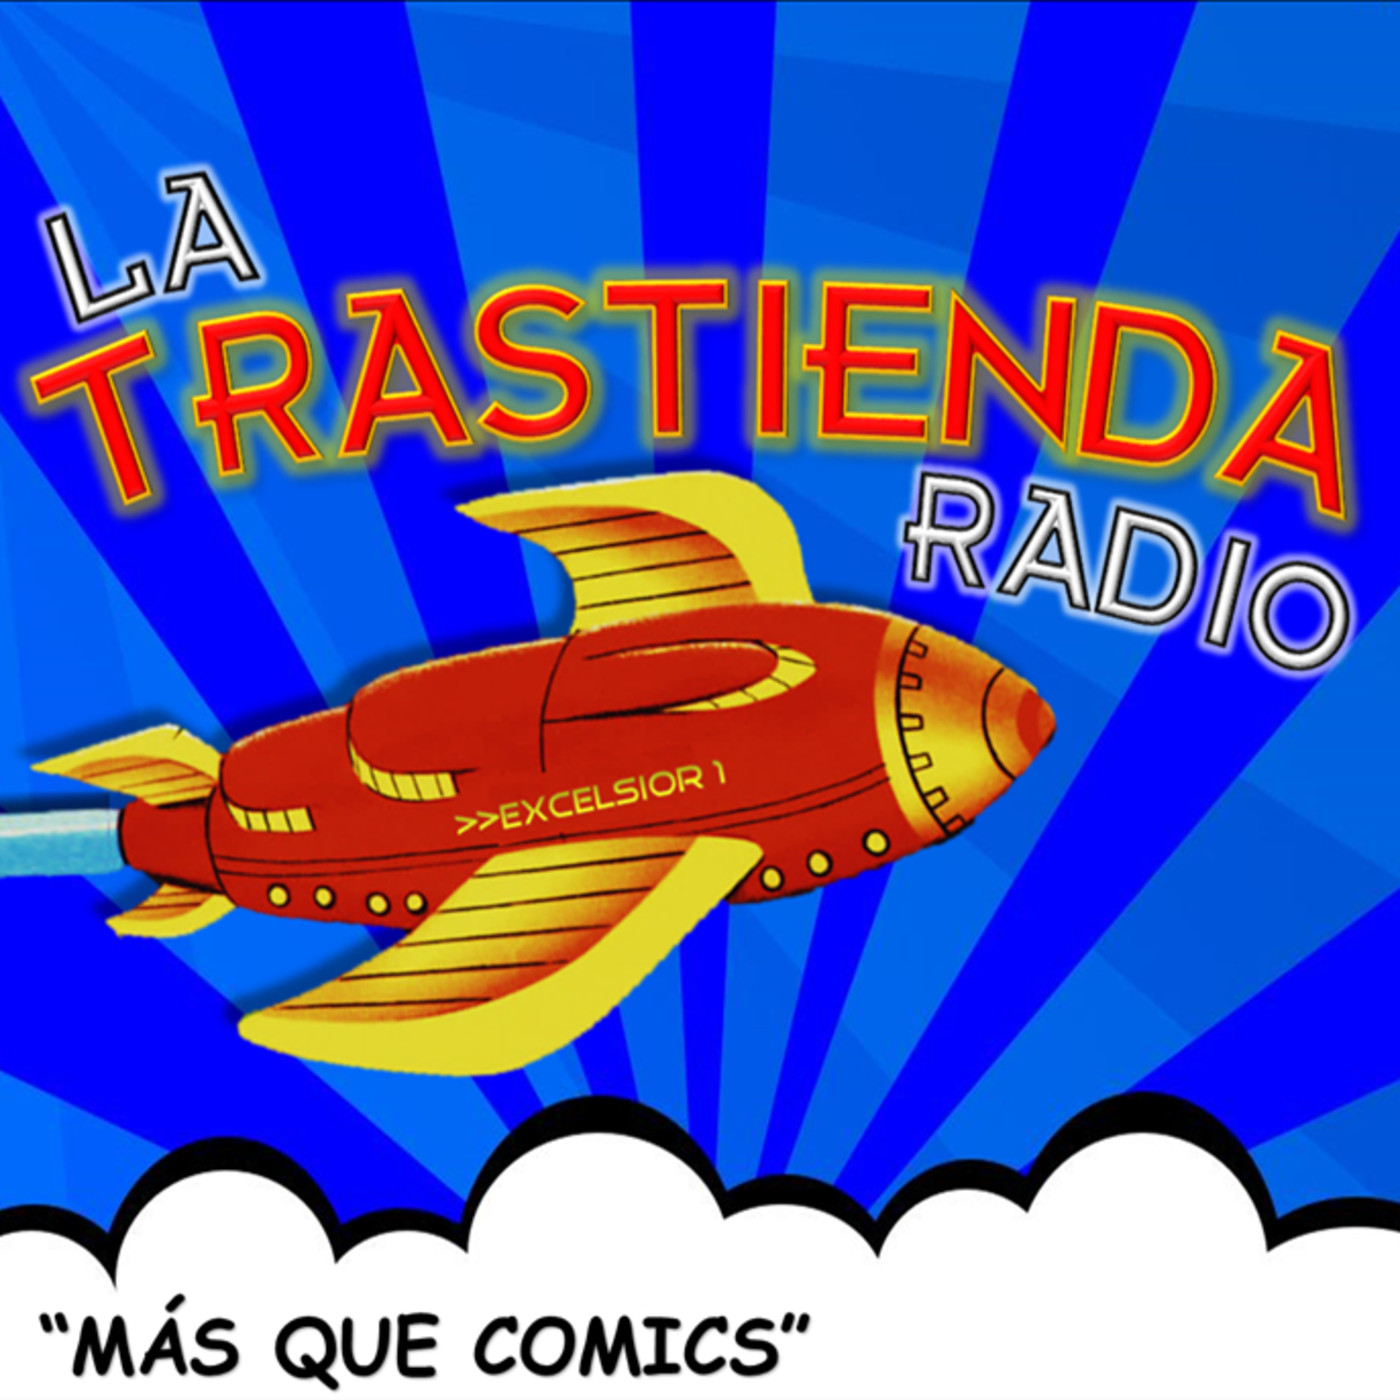 <![CDATA[LA TRASTIENDA RADIO (Cómics, manga y anime)]]>